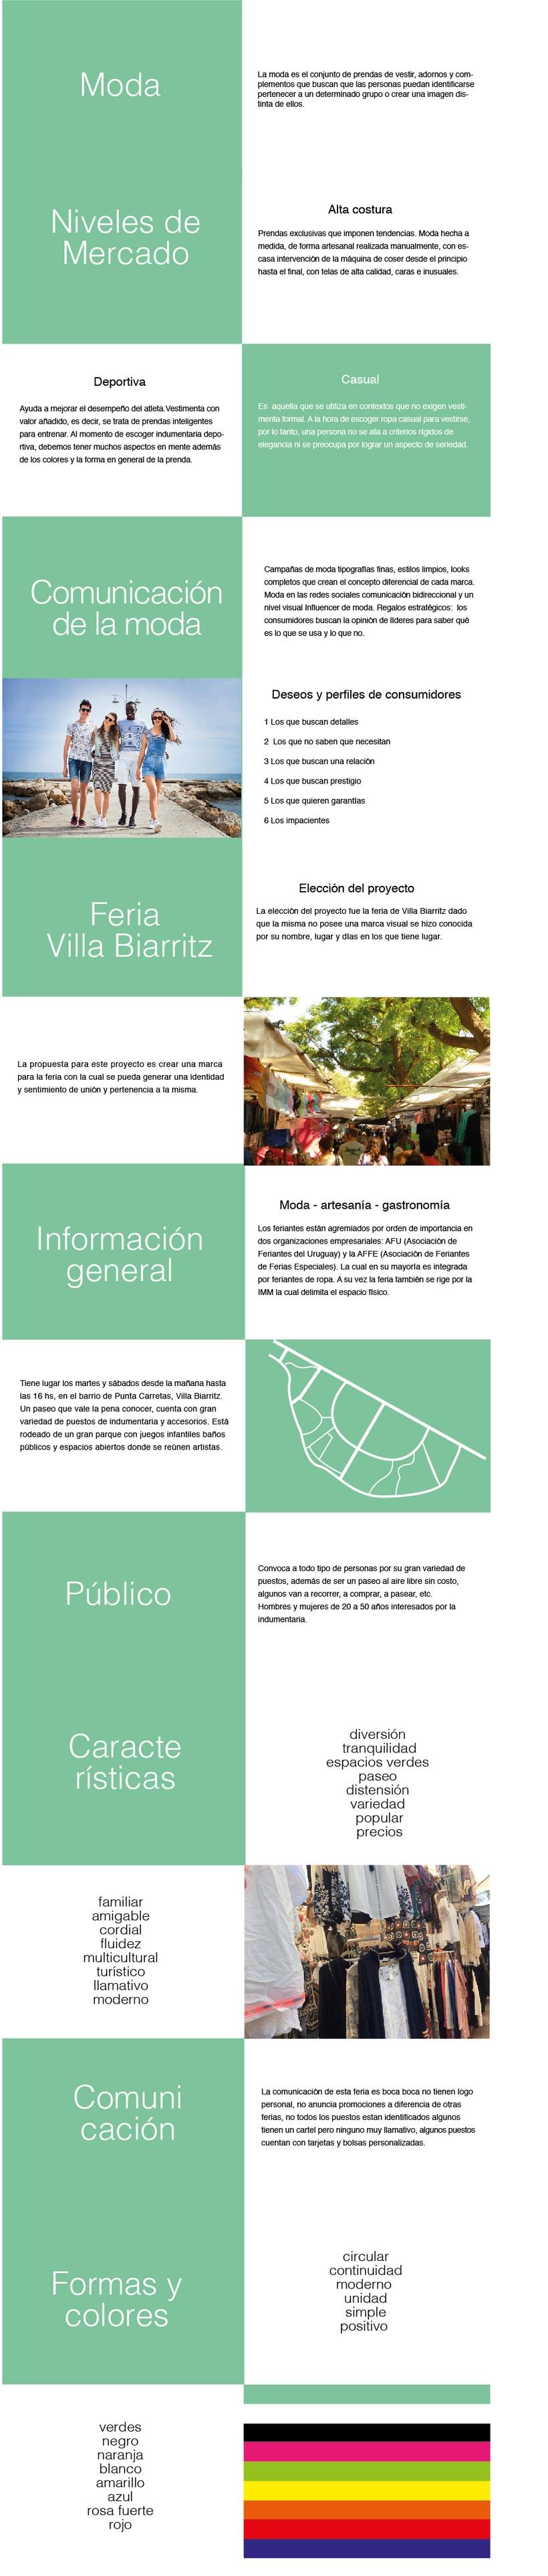 Feria de Villa Biarritz 1